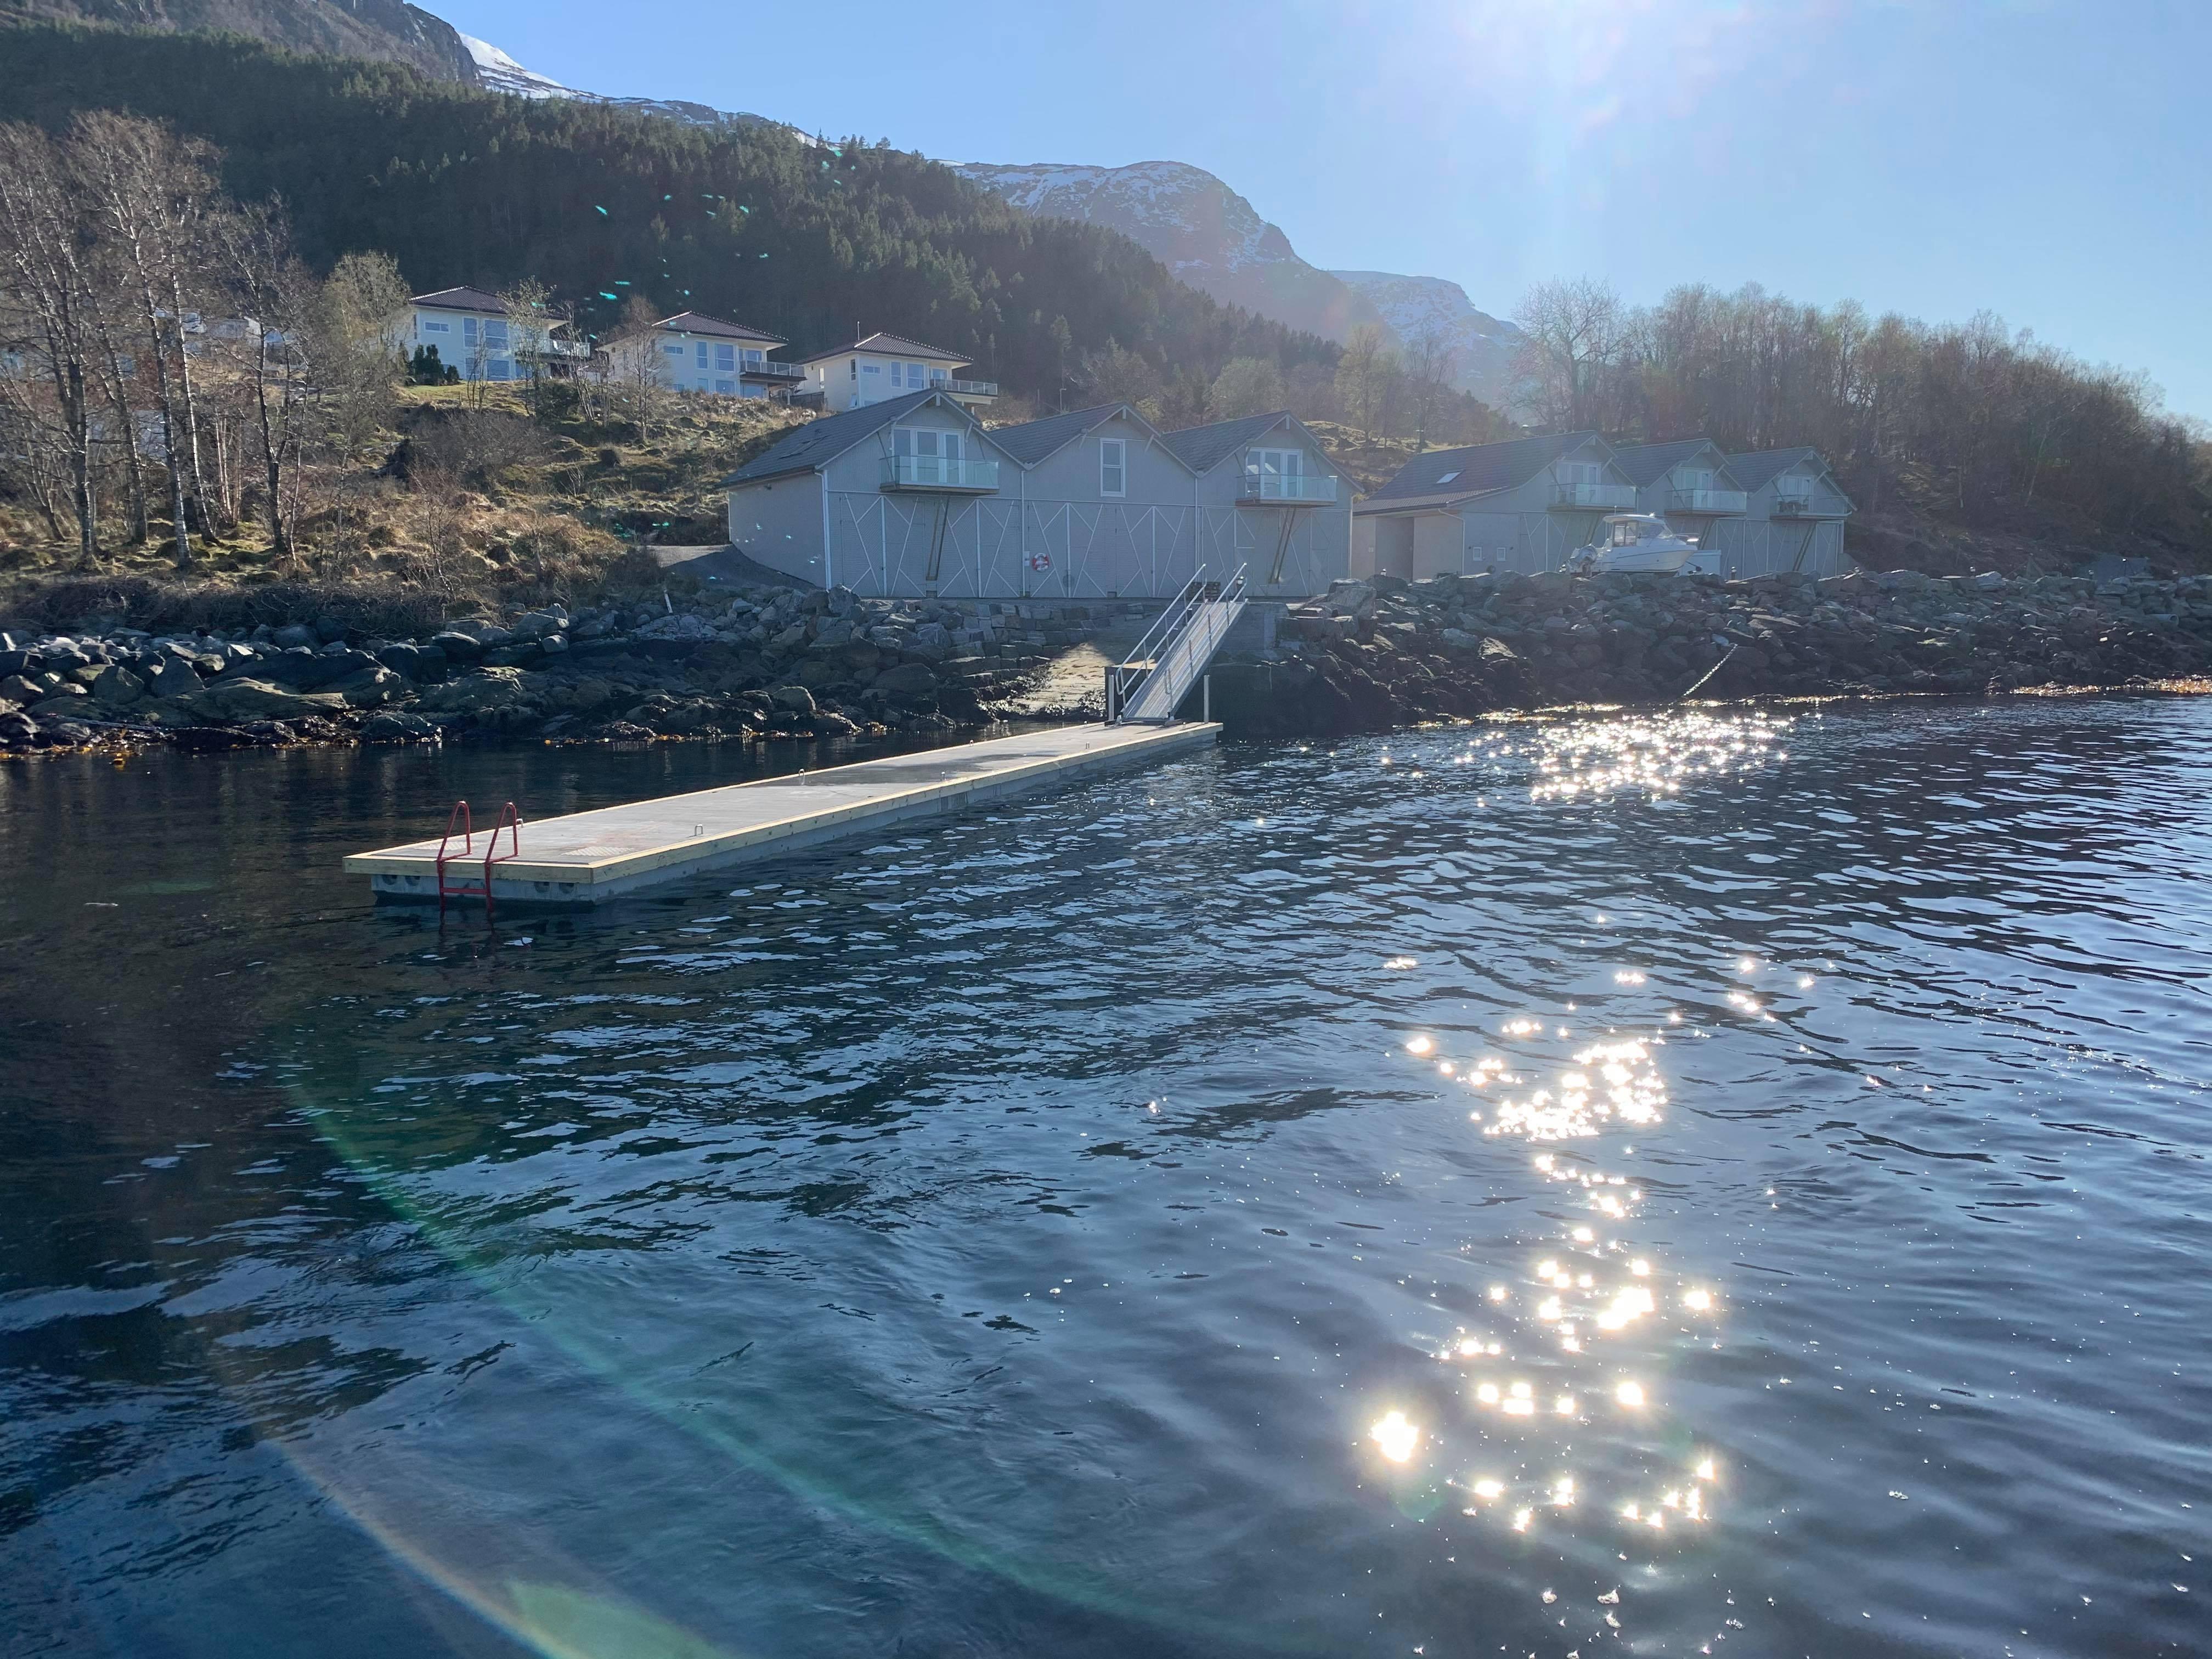 https://www.marinasolutions.no/uploads/Sletta-Byggelag-2020-6.jpg